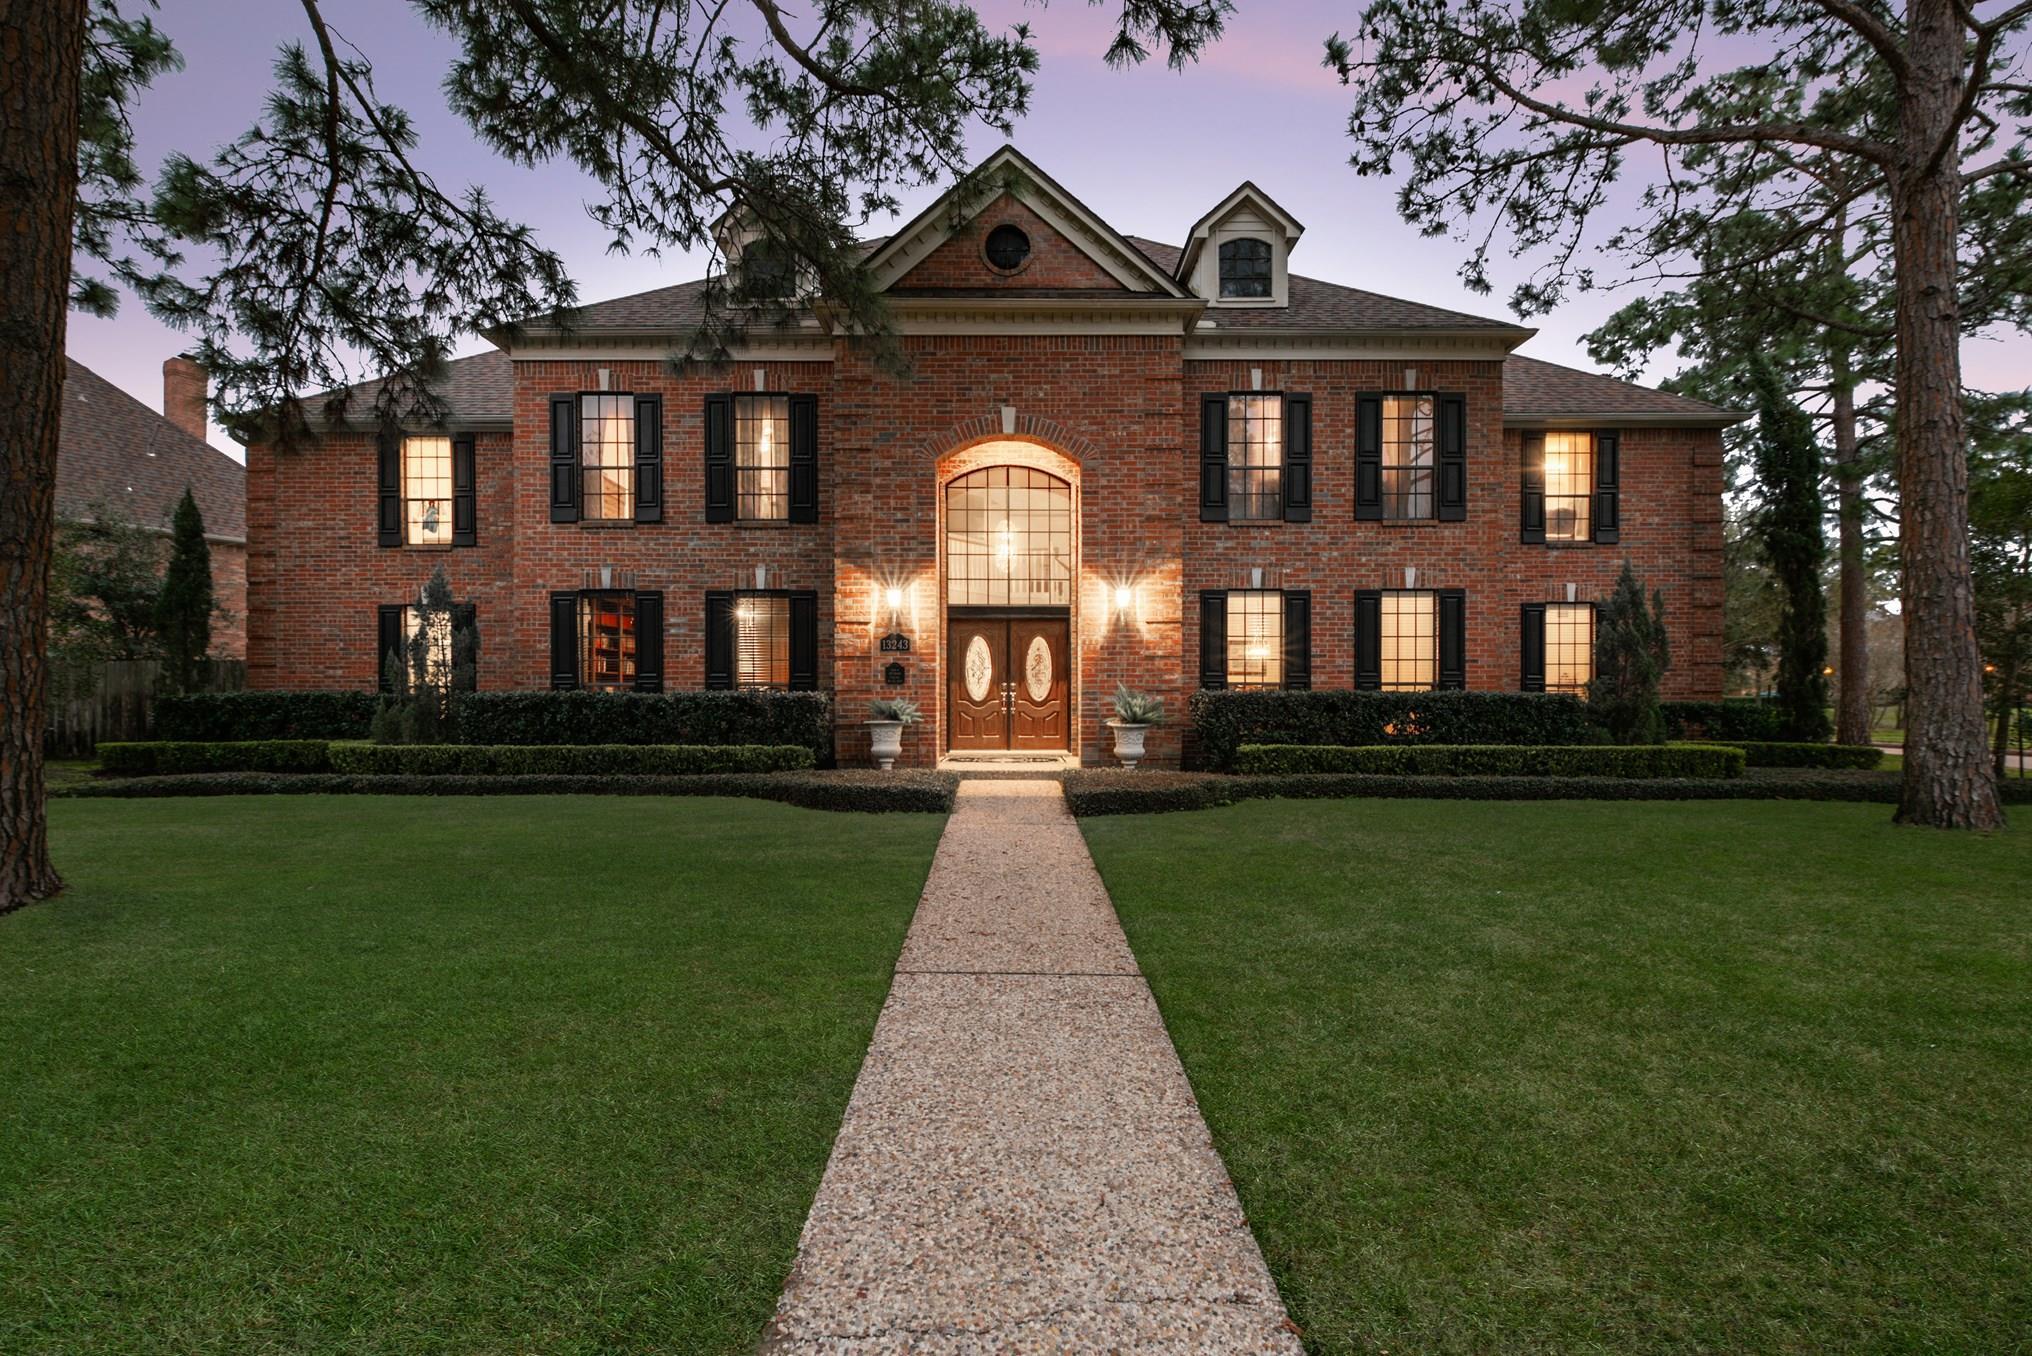 13243 Oregold Drive Property Photo - Houston, TX real estate listing